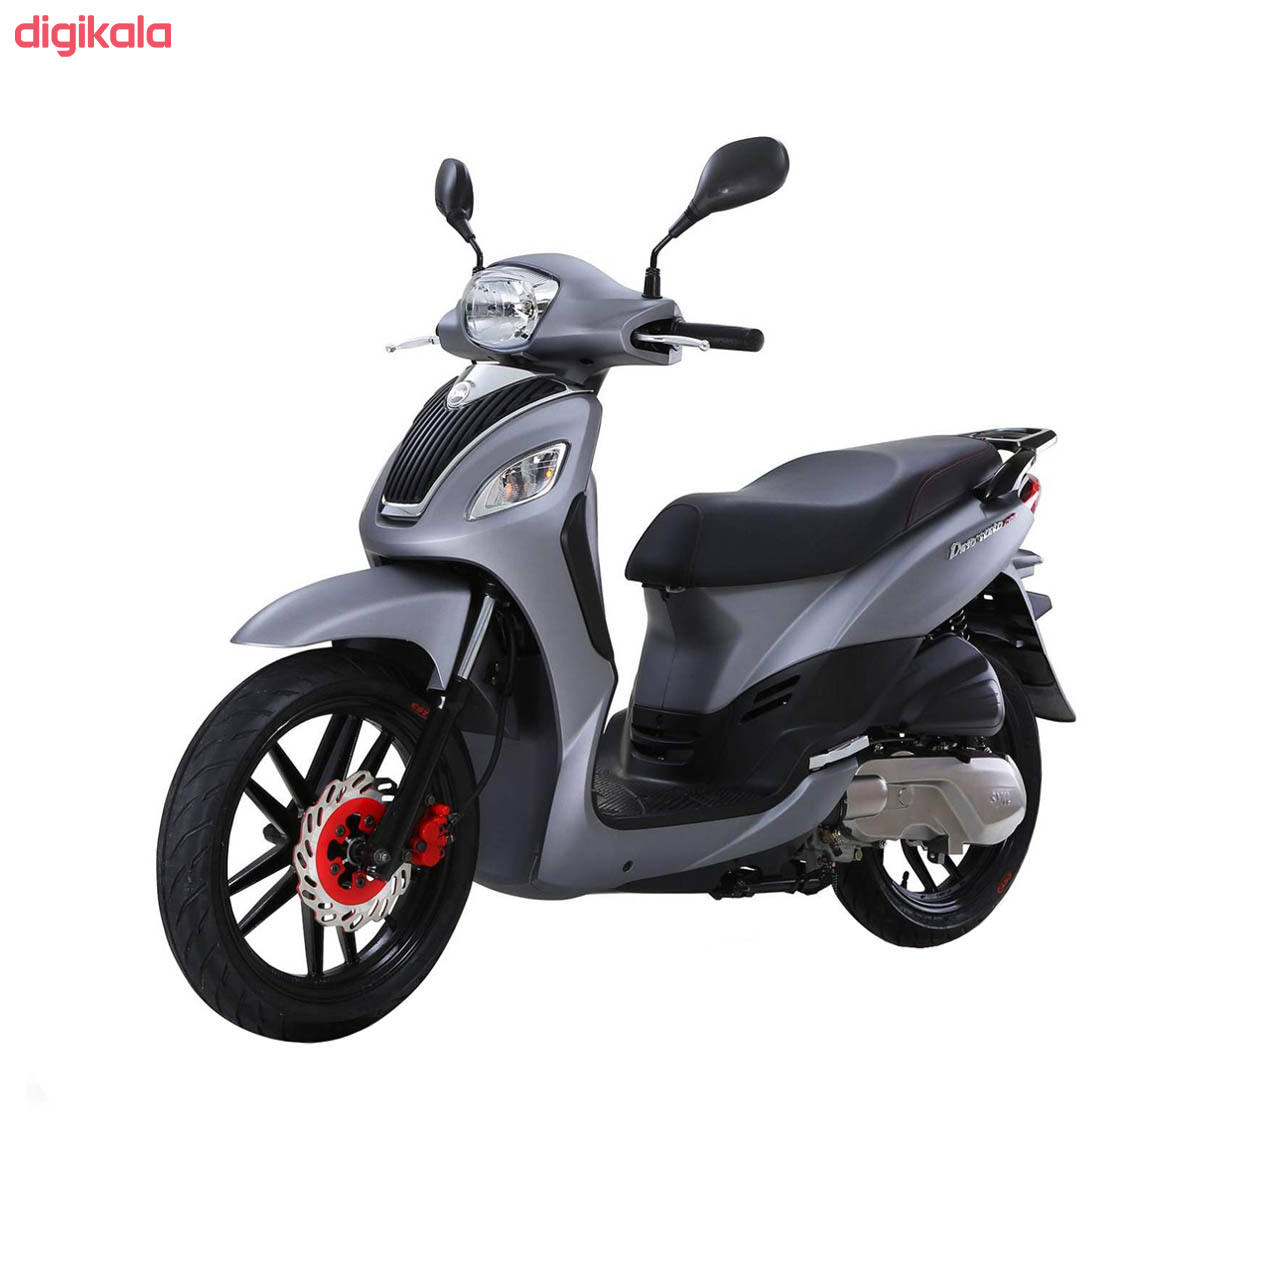 موتورسیکلت دینو مدل ویند 200 سی سی سال 1399 main 1 3